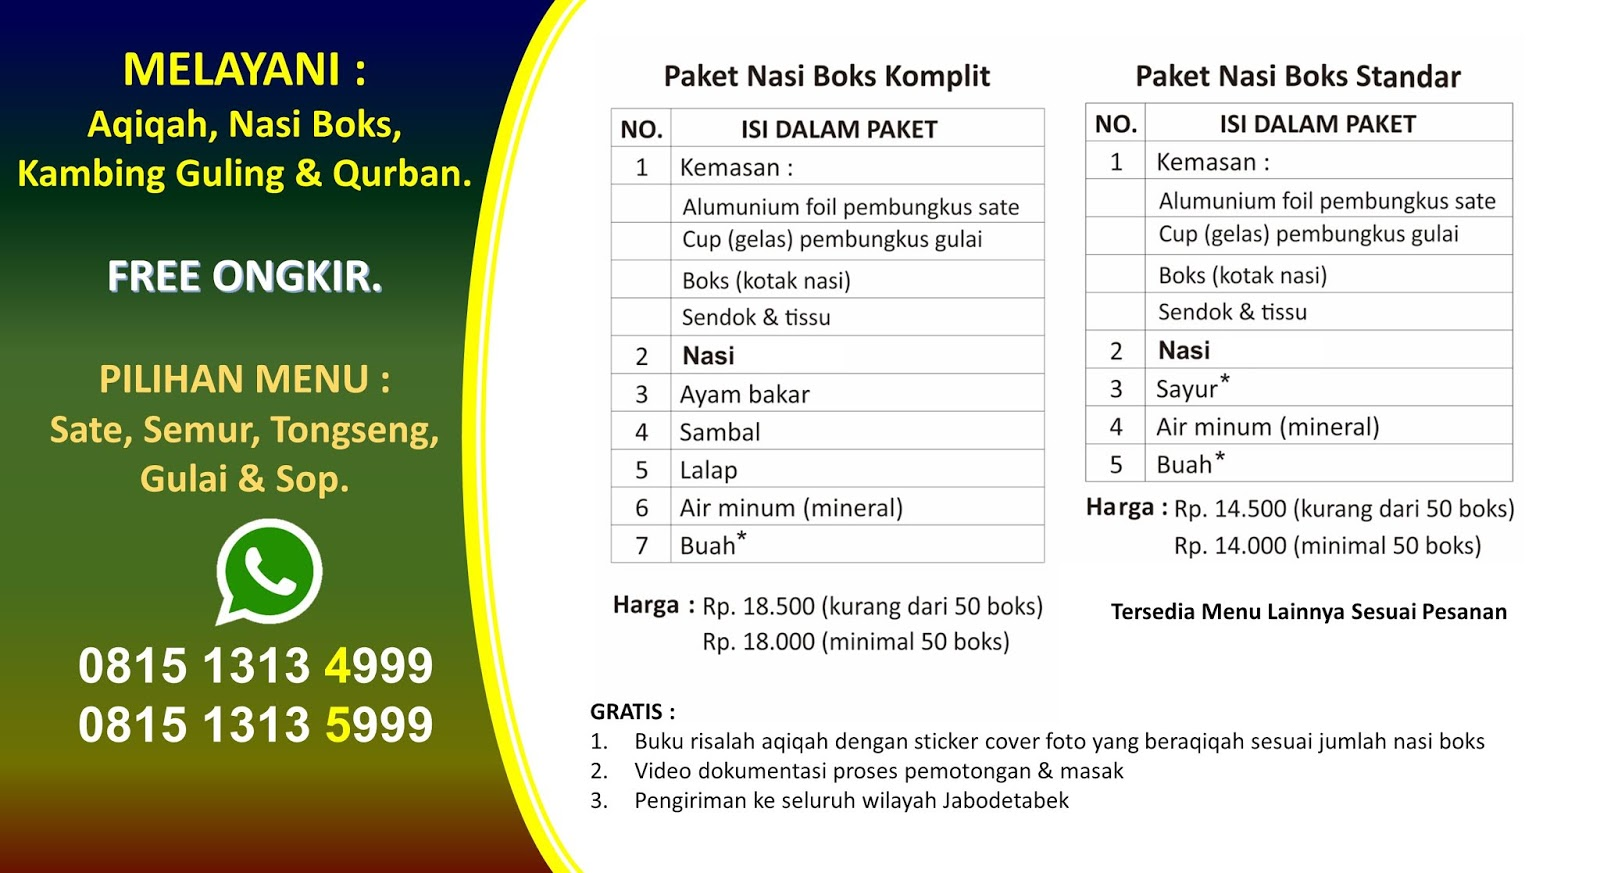 Harga Kambing Aqiqah Murah Untuk Laki-Laki Kabupaten Bogor Jawa Barat